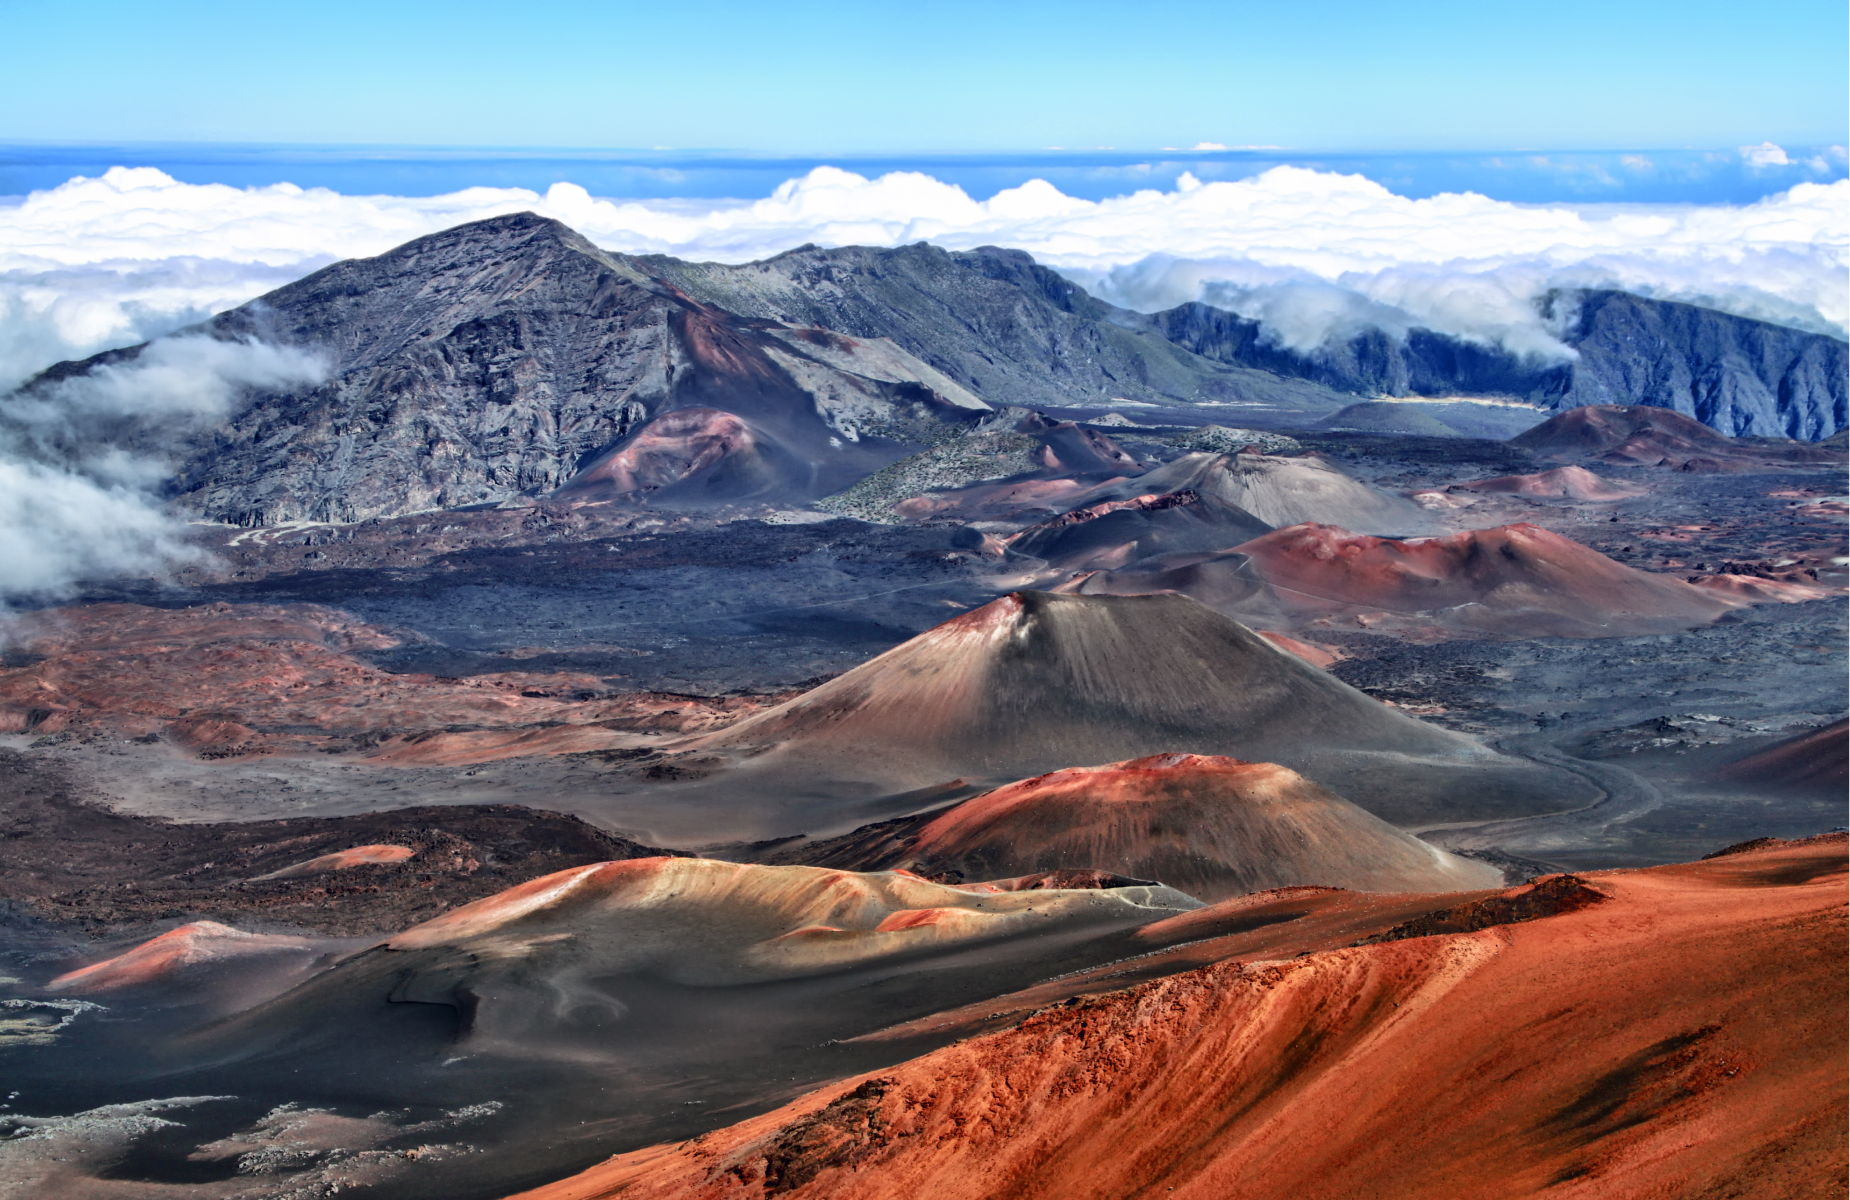 Panoramic view of Haleakala Volcano in Haleakala National Park, Maui